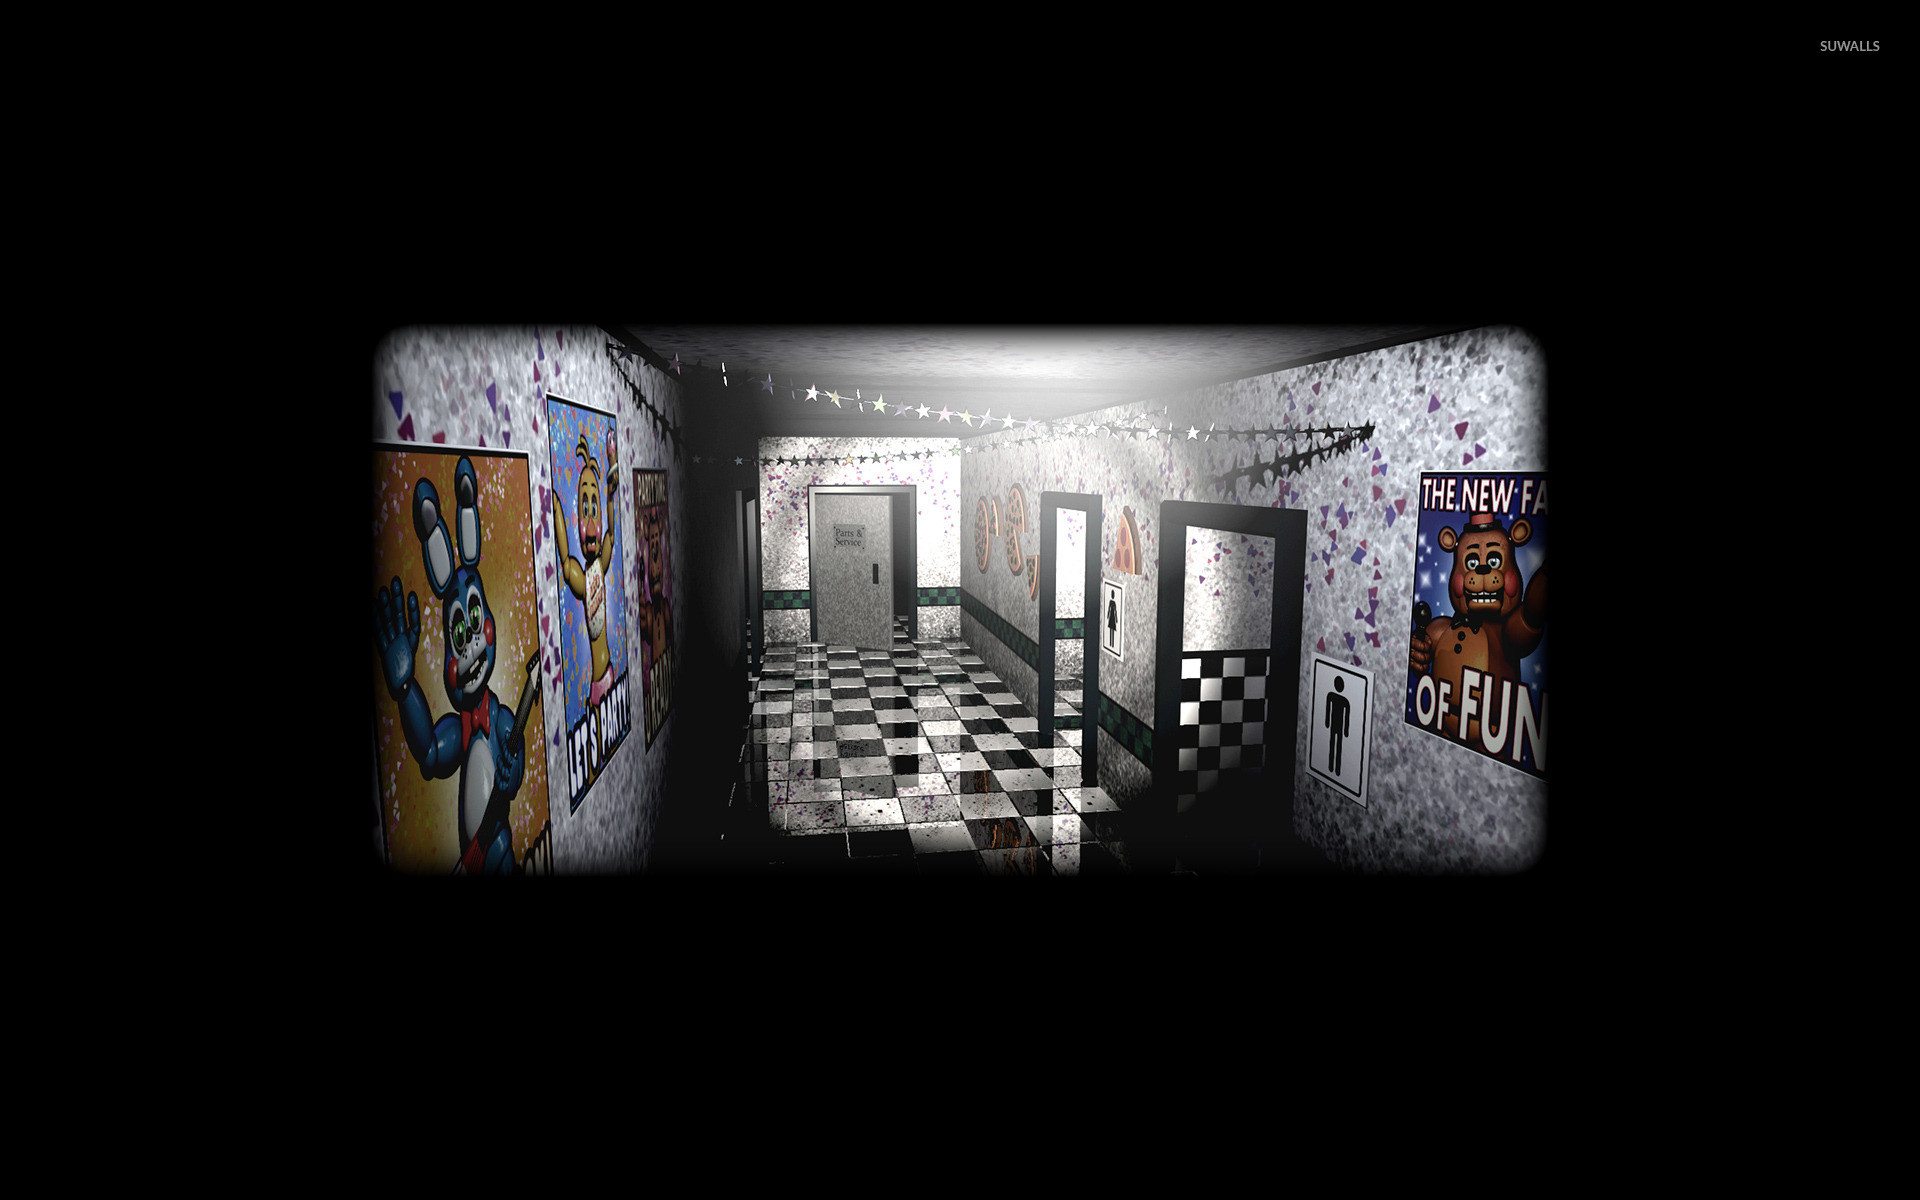 Five Nights at Freddy's [6] wallpaper jpg